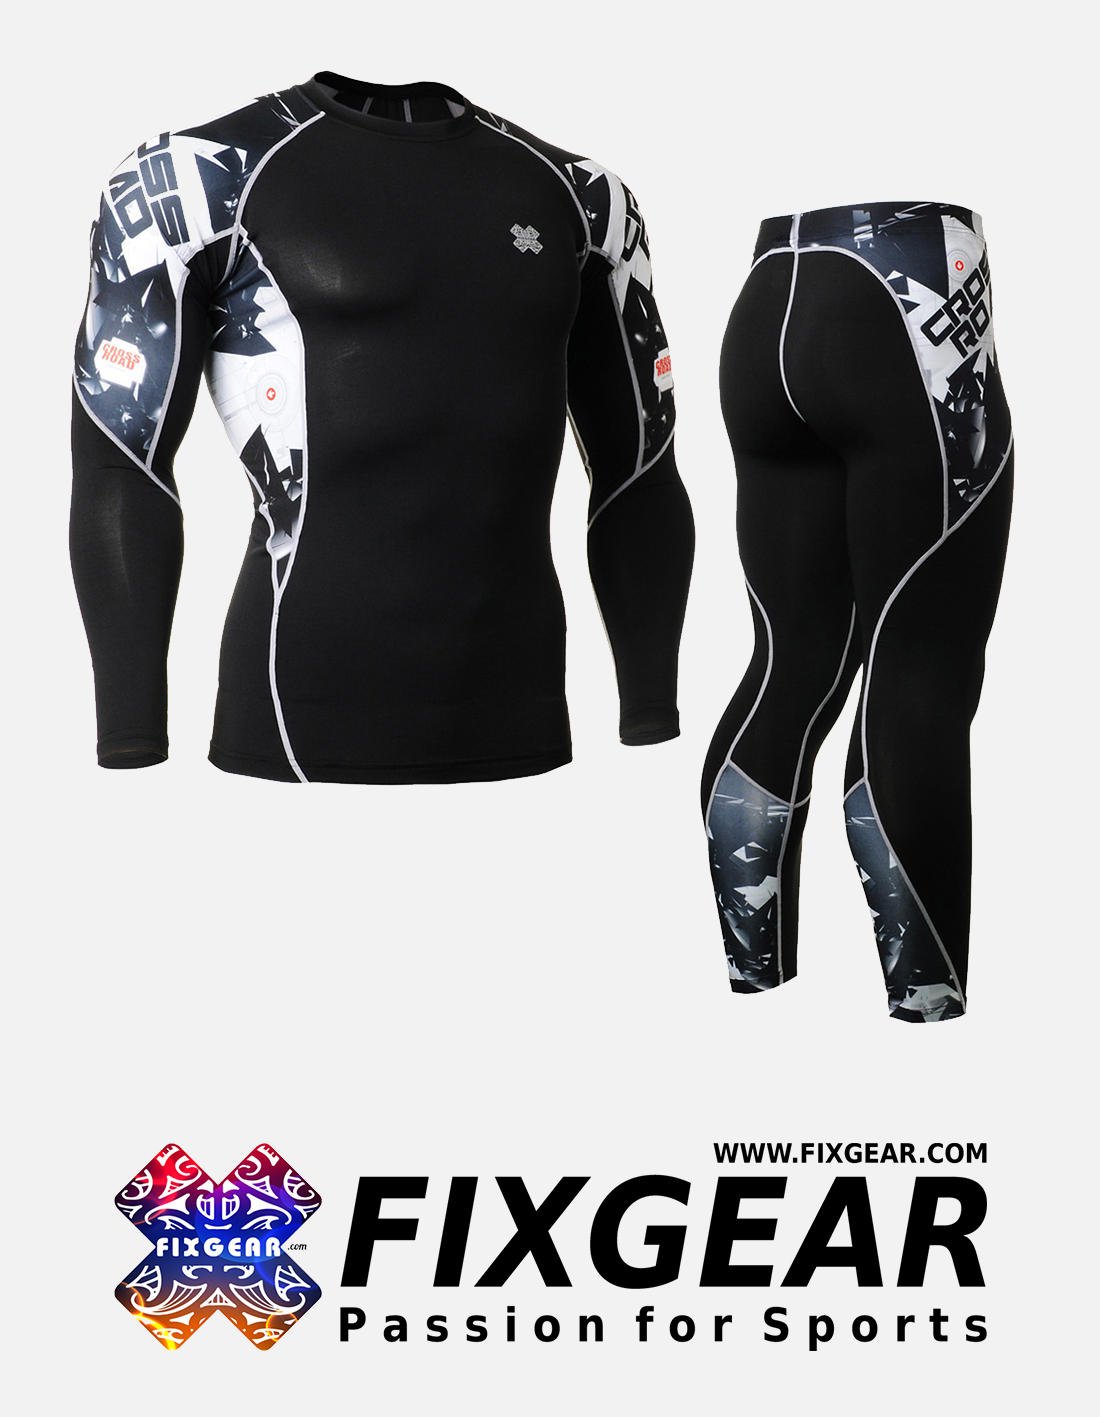 FIXGEAR C2L-P2L-B17 Set Compression Base Layer Shirt & Legging Pants